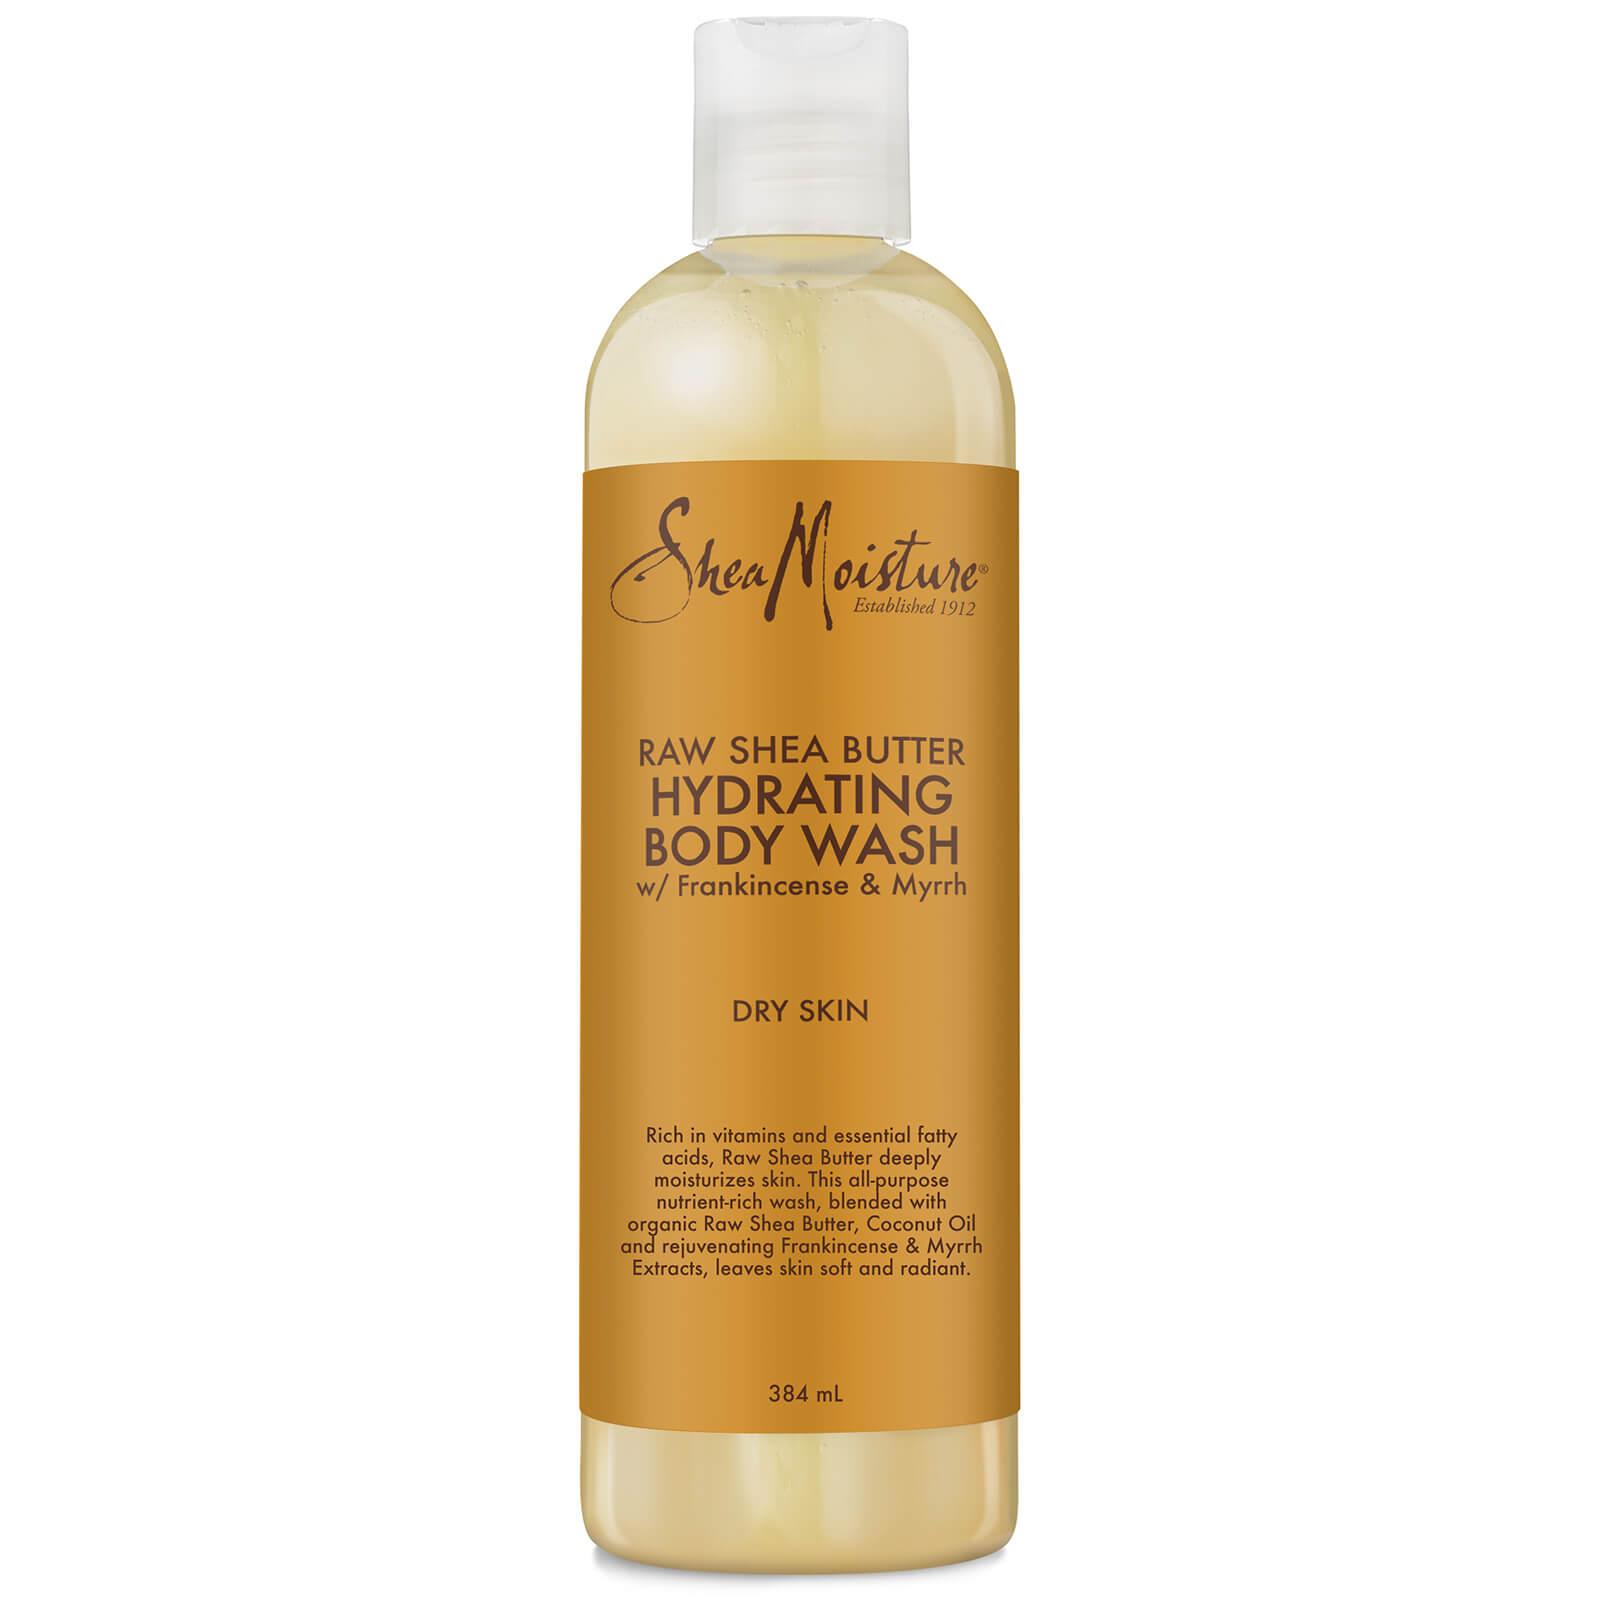 shea moisture raw shea butter hydrating body wash 384ml